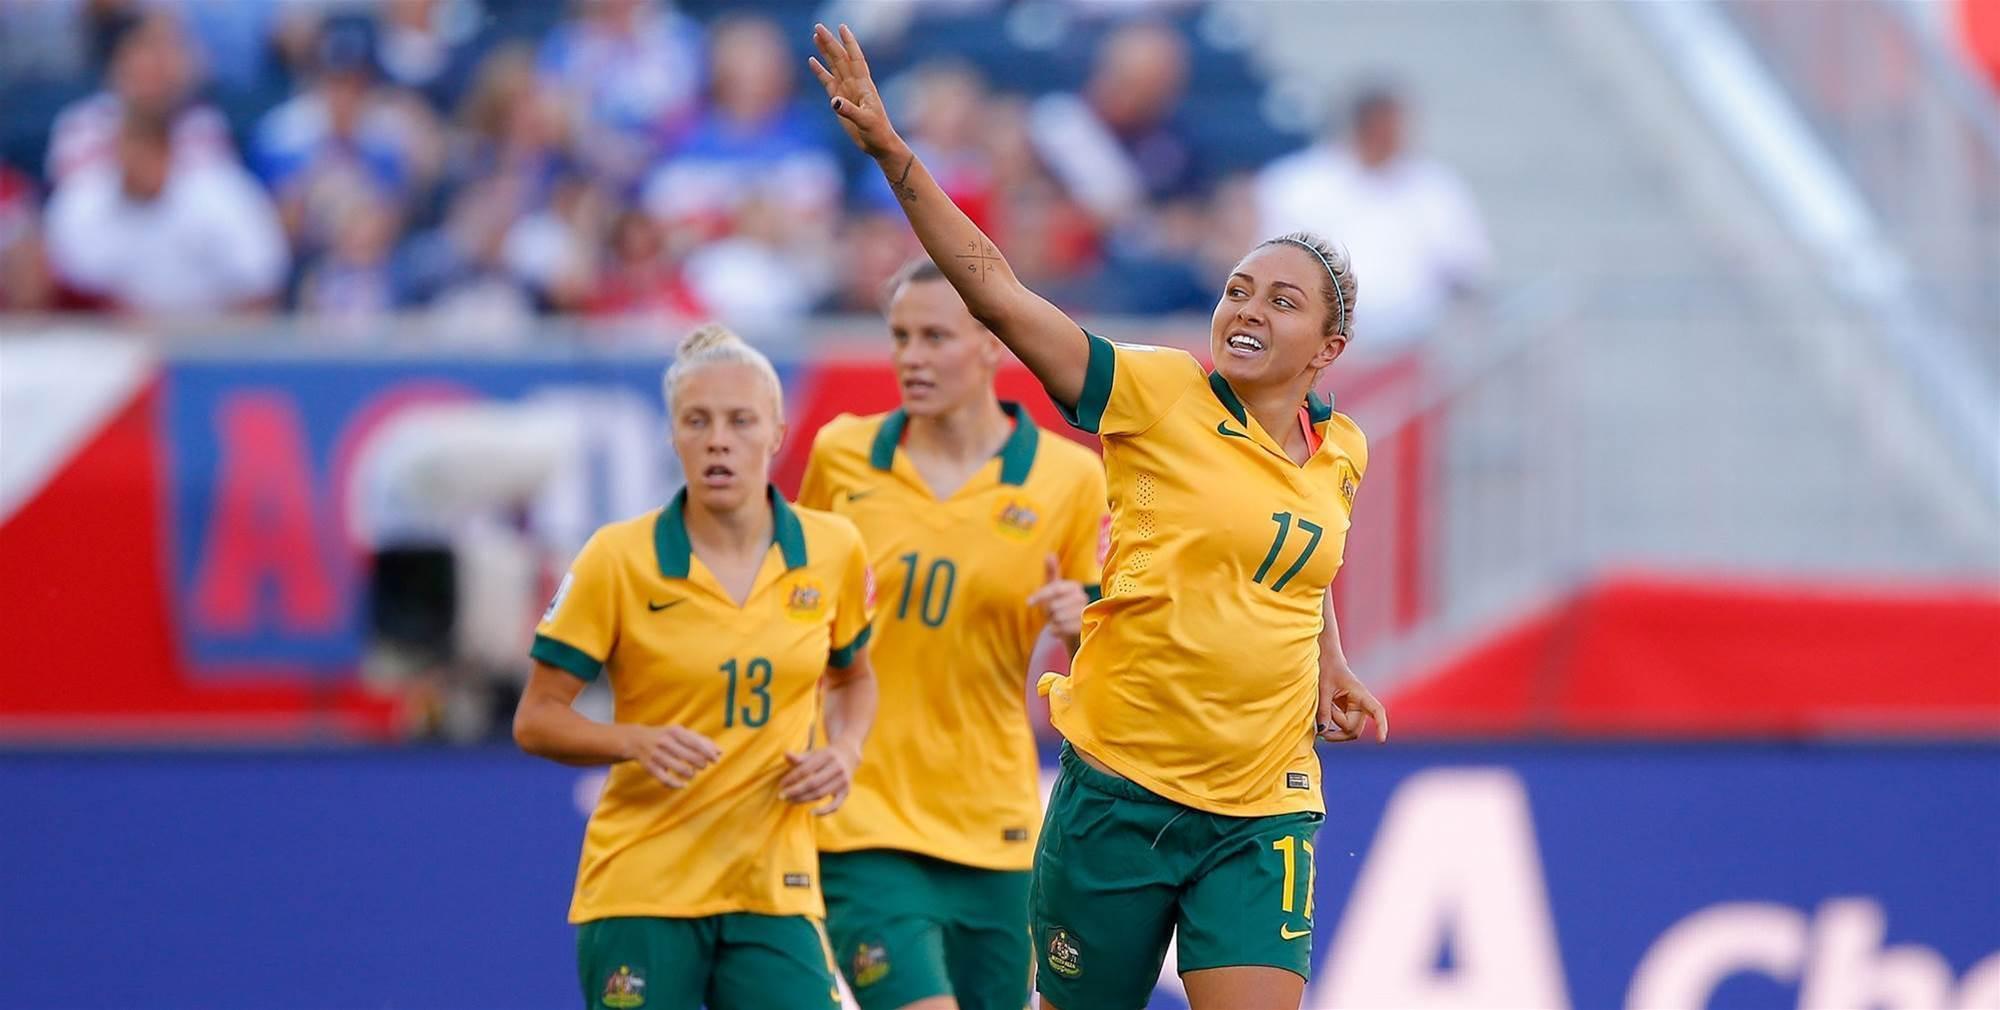 Australia bid to host Women's World Cup